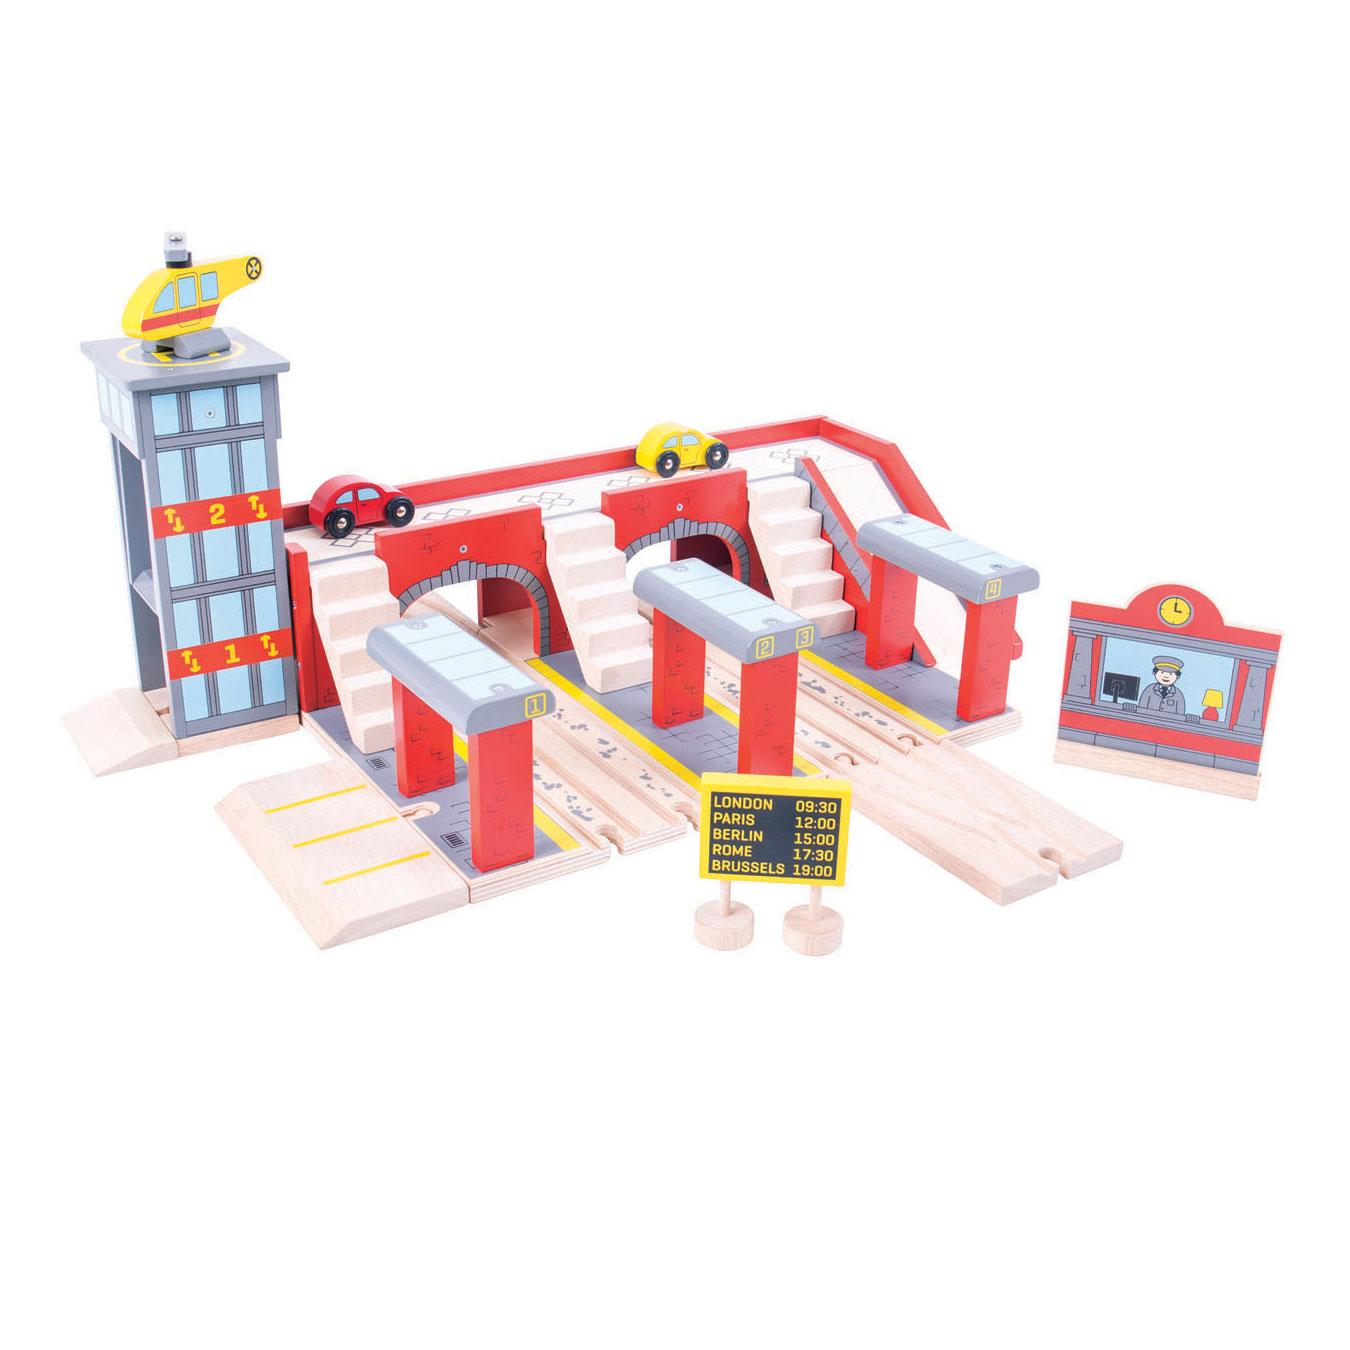 Houten Centraal Station online kopen | Lobbes Speelgoed